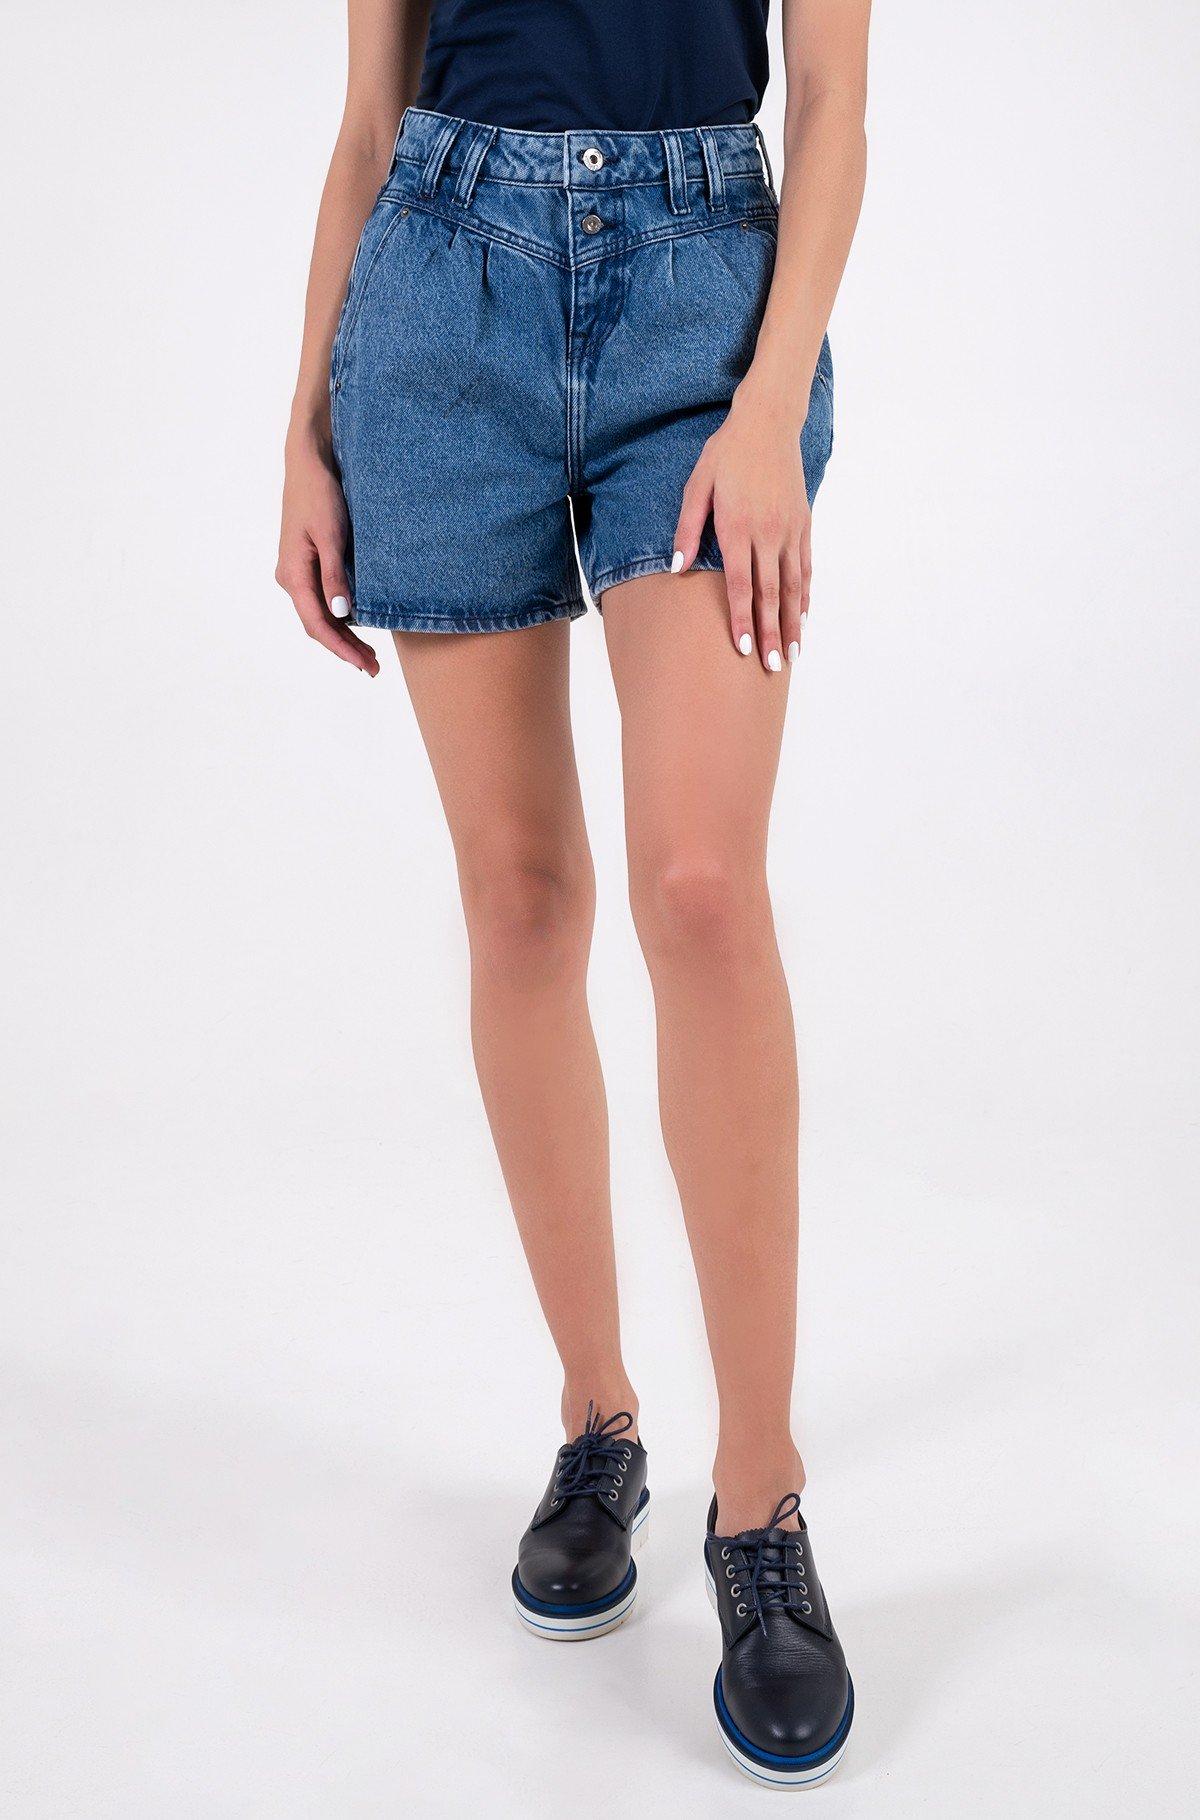 Shorts 101-1200-full-1